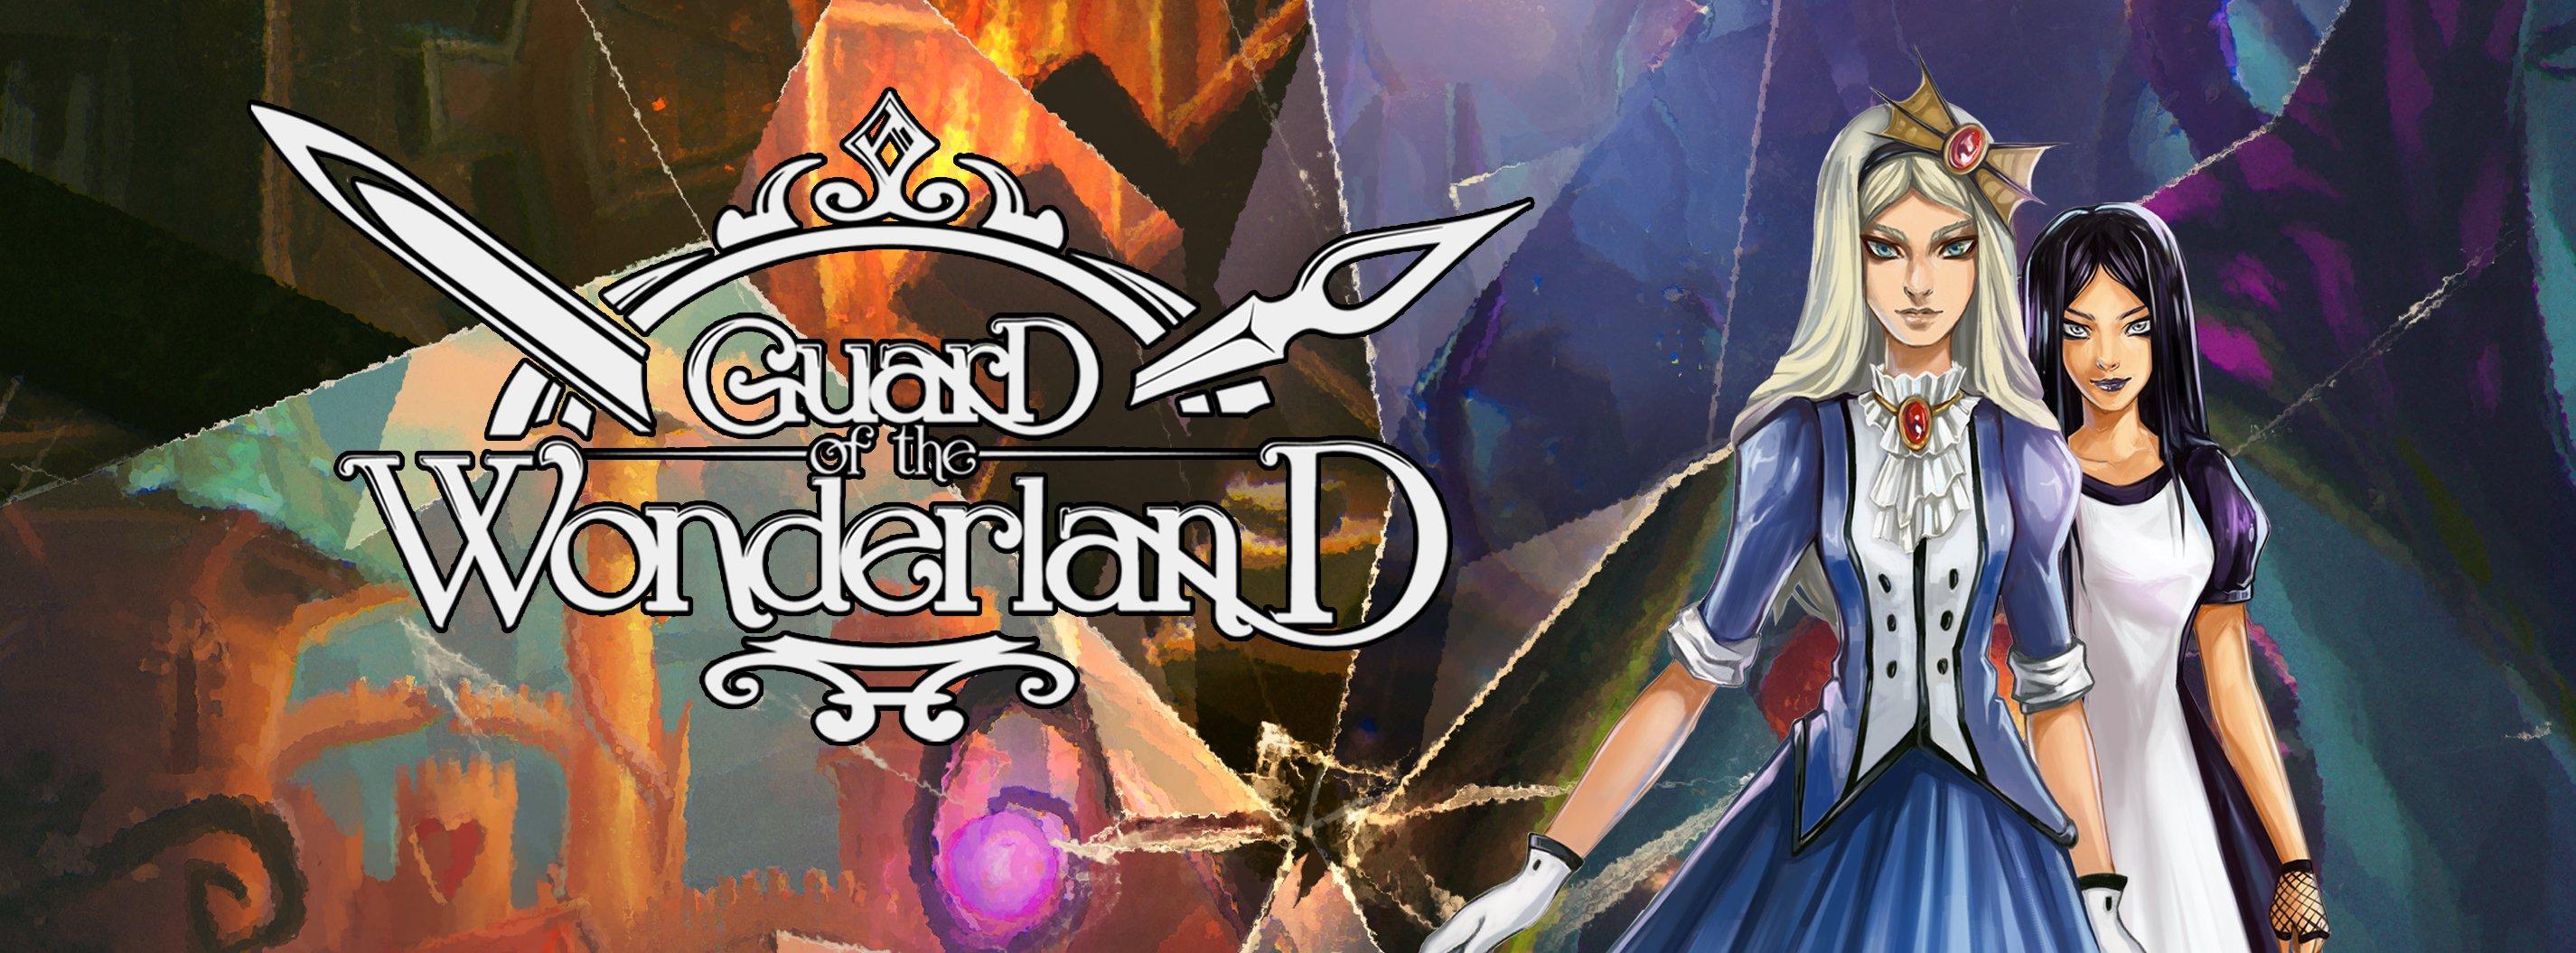 Guard of the Wonderland на #GamesJam - Изображение 1